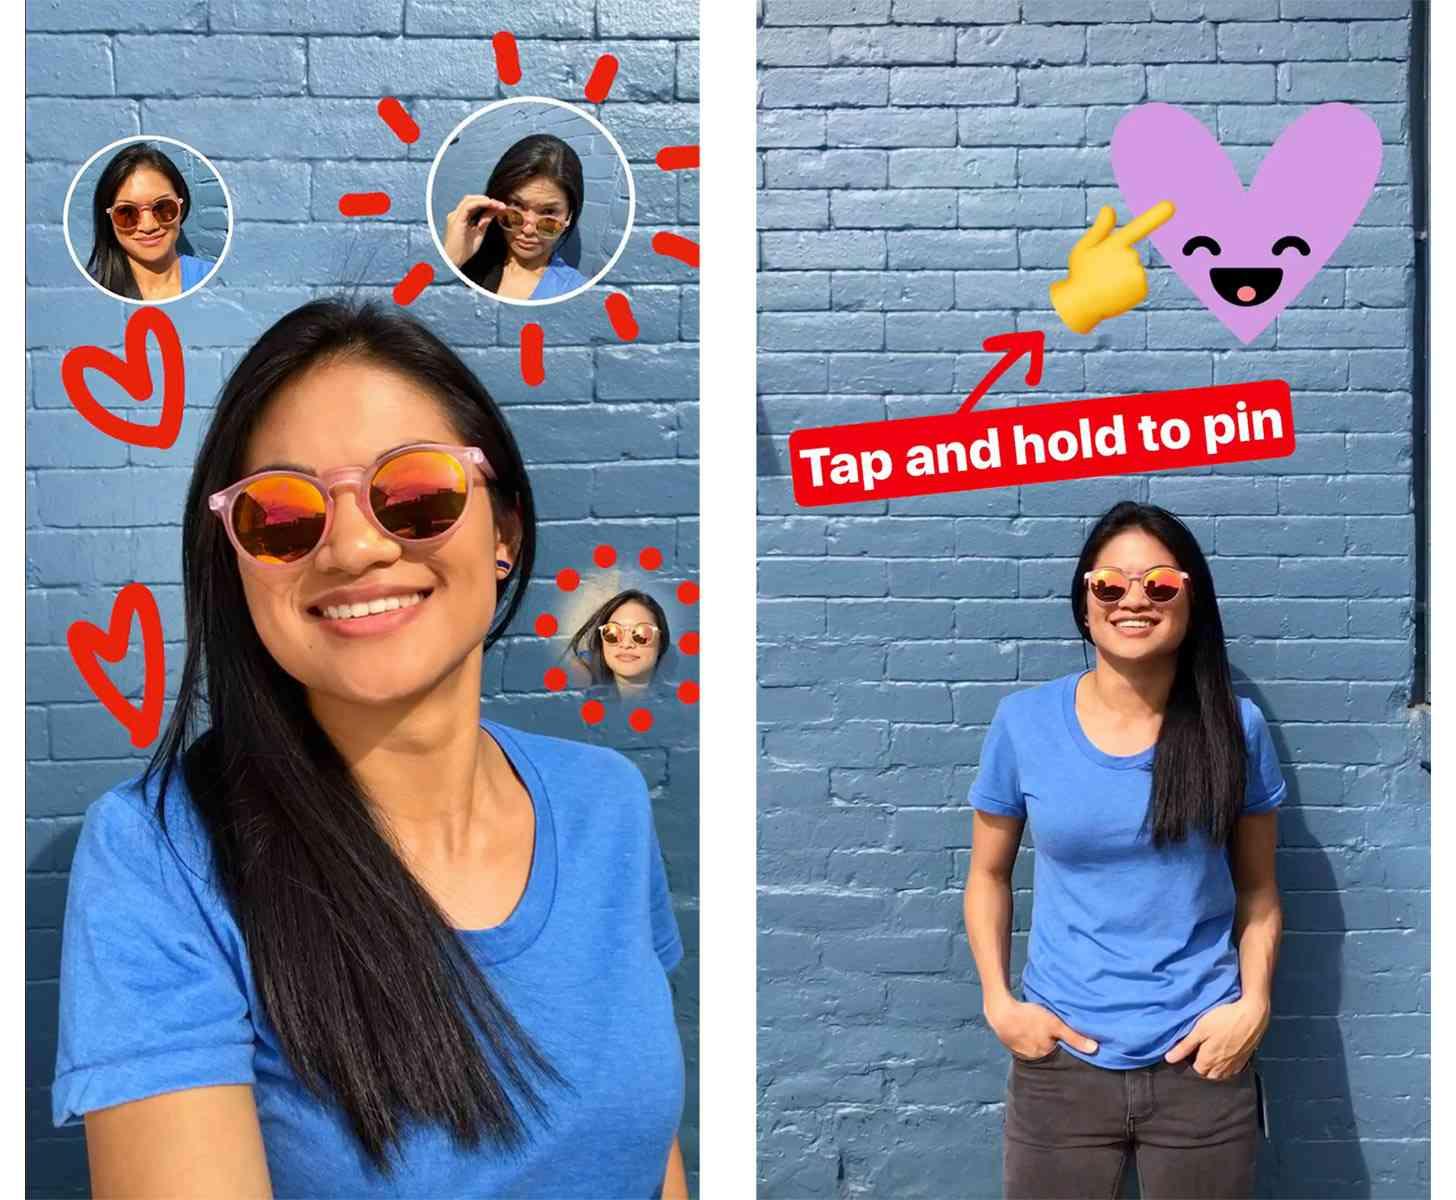 Instagram Stories selfie stickers